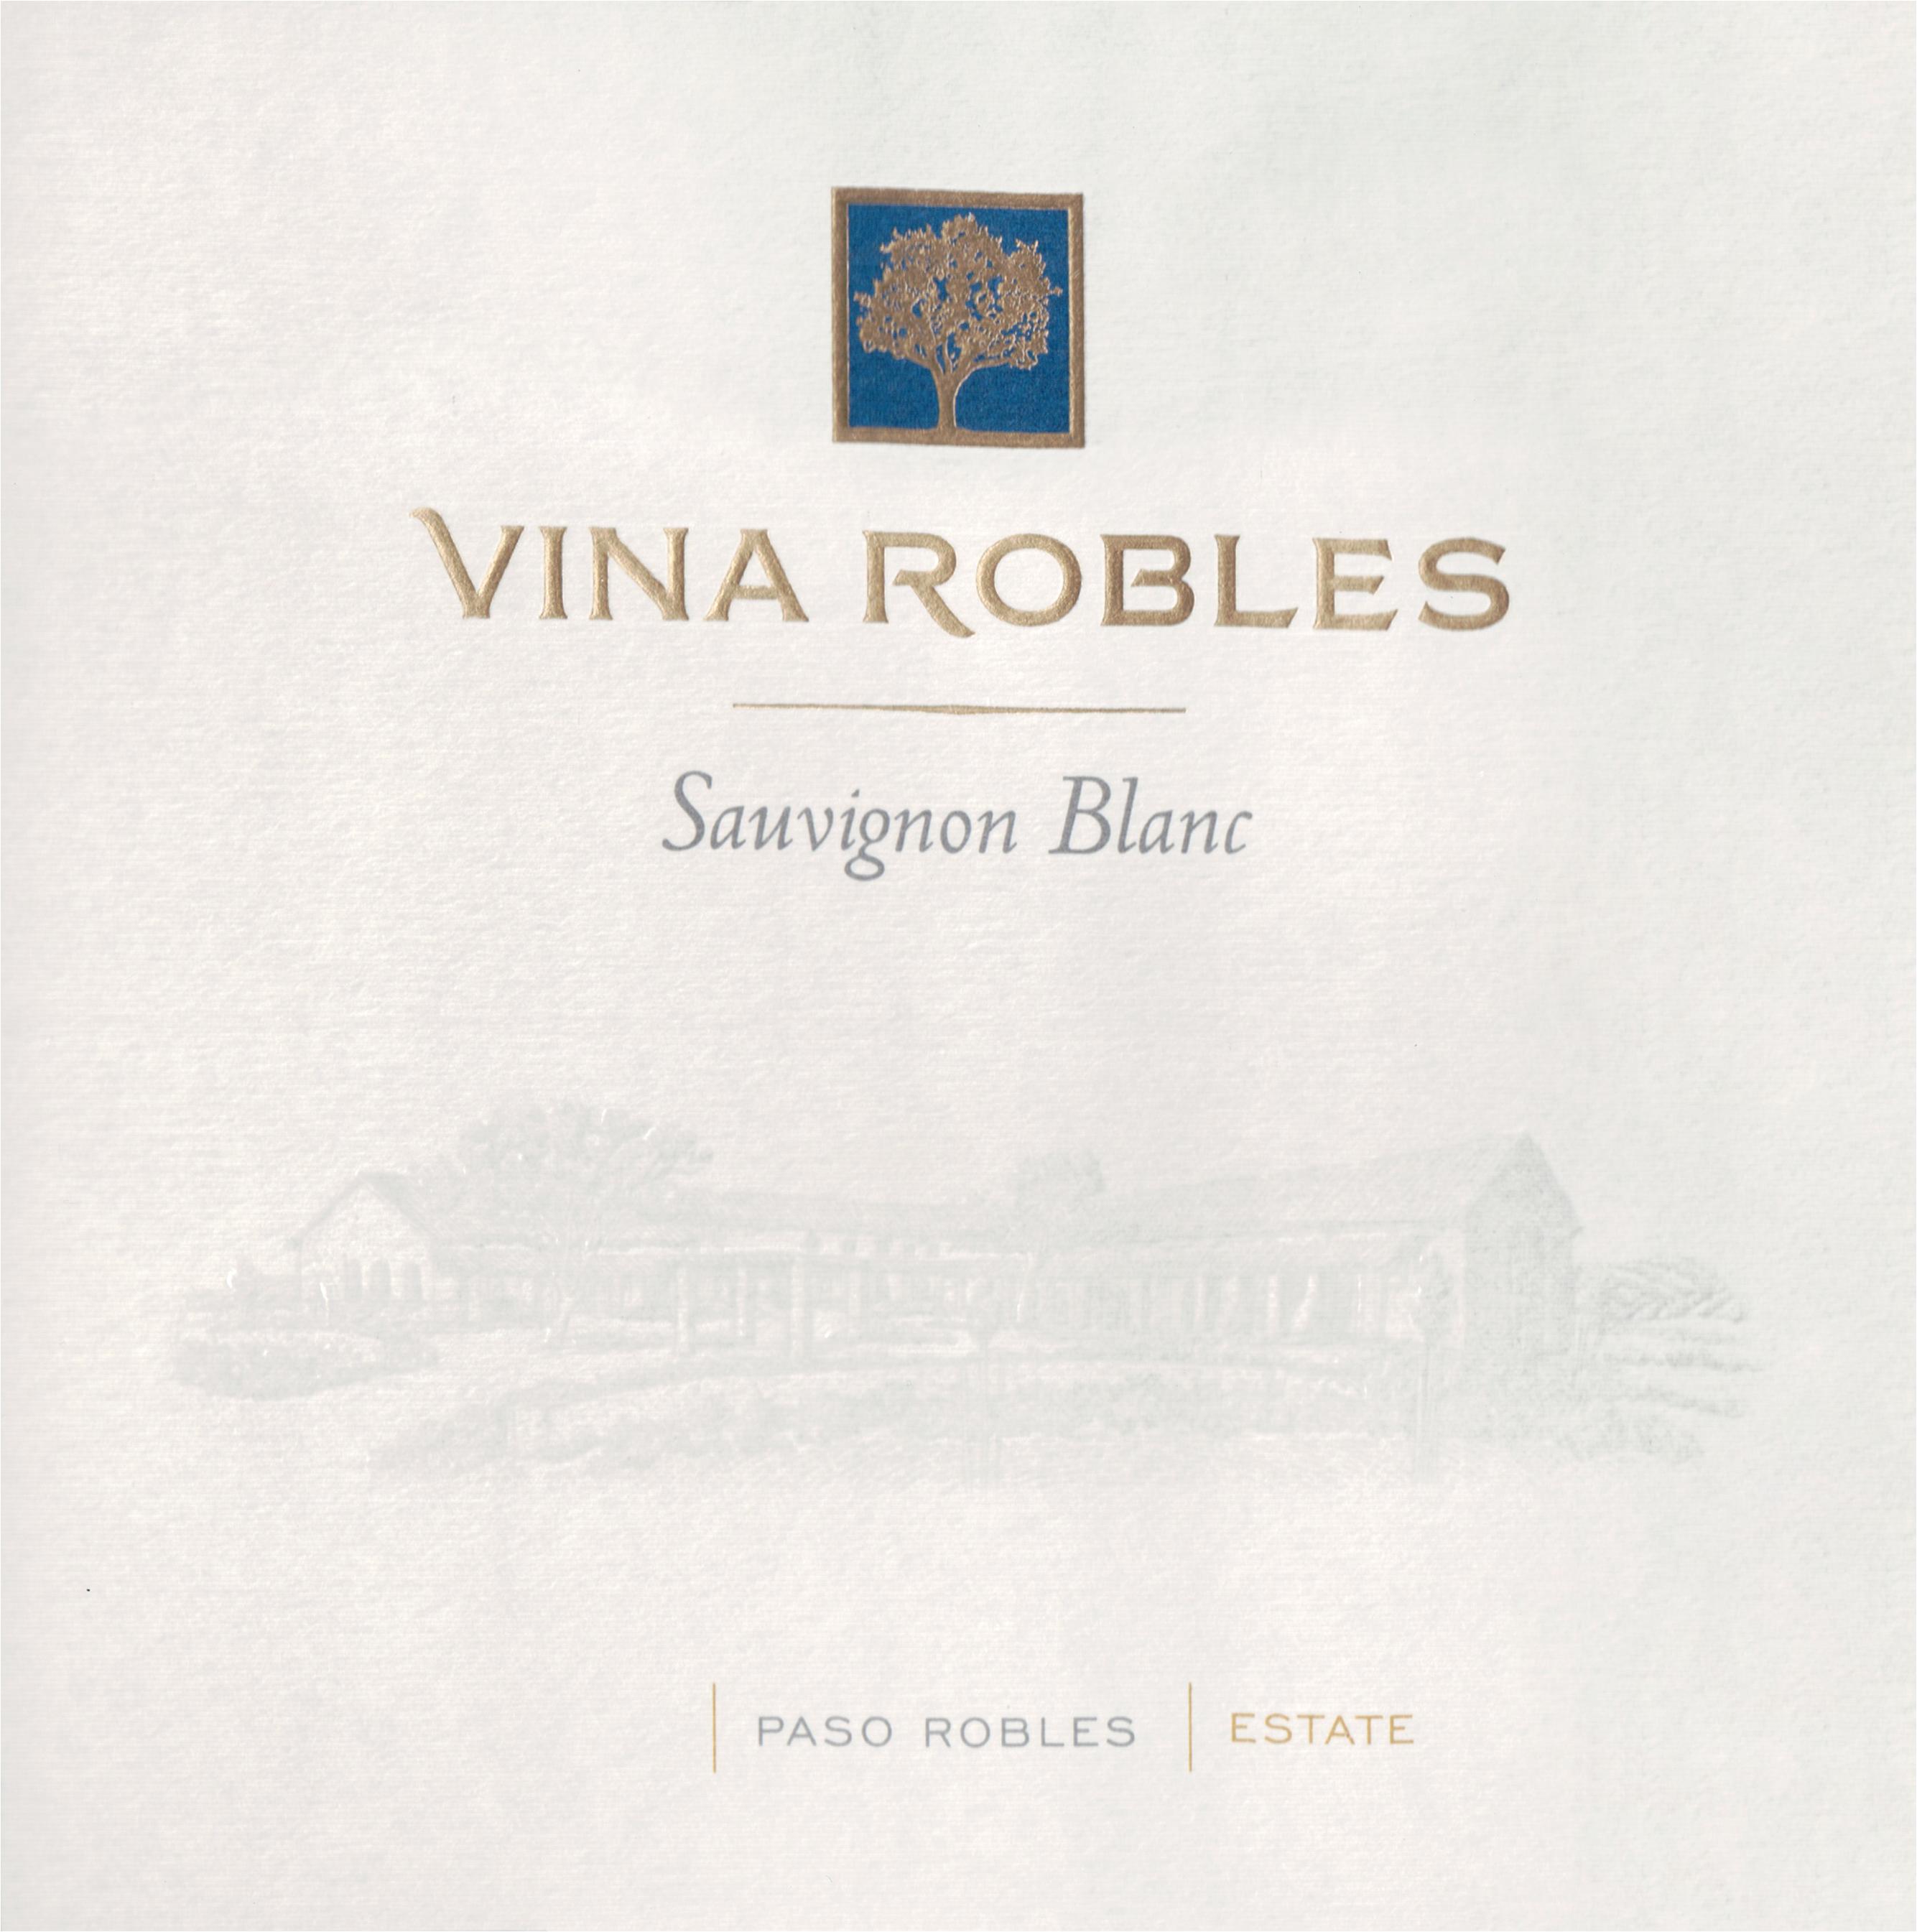 Vina Robles Sauvignon Blanc 2019